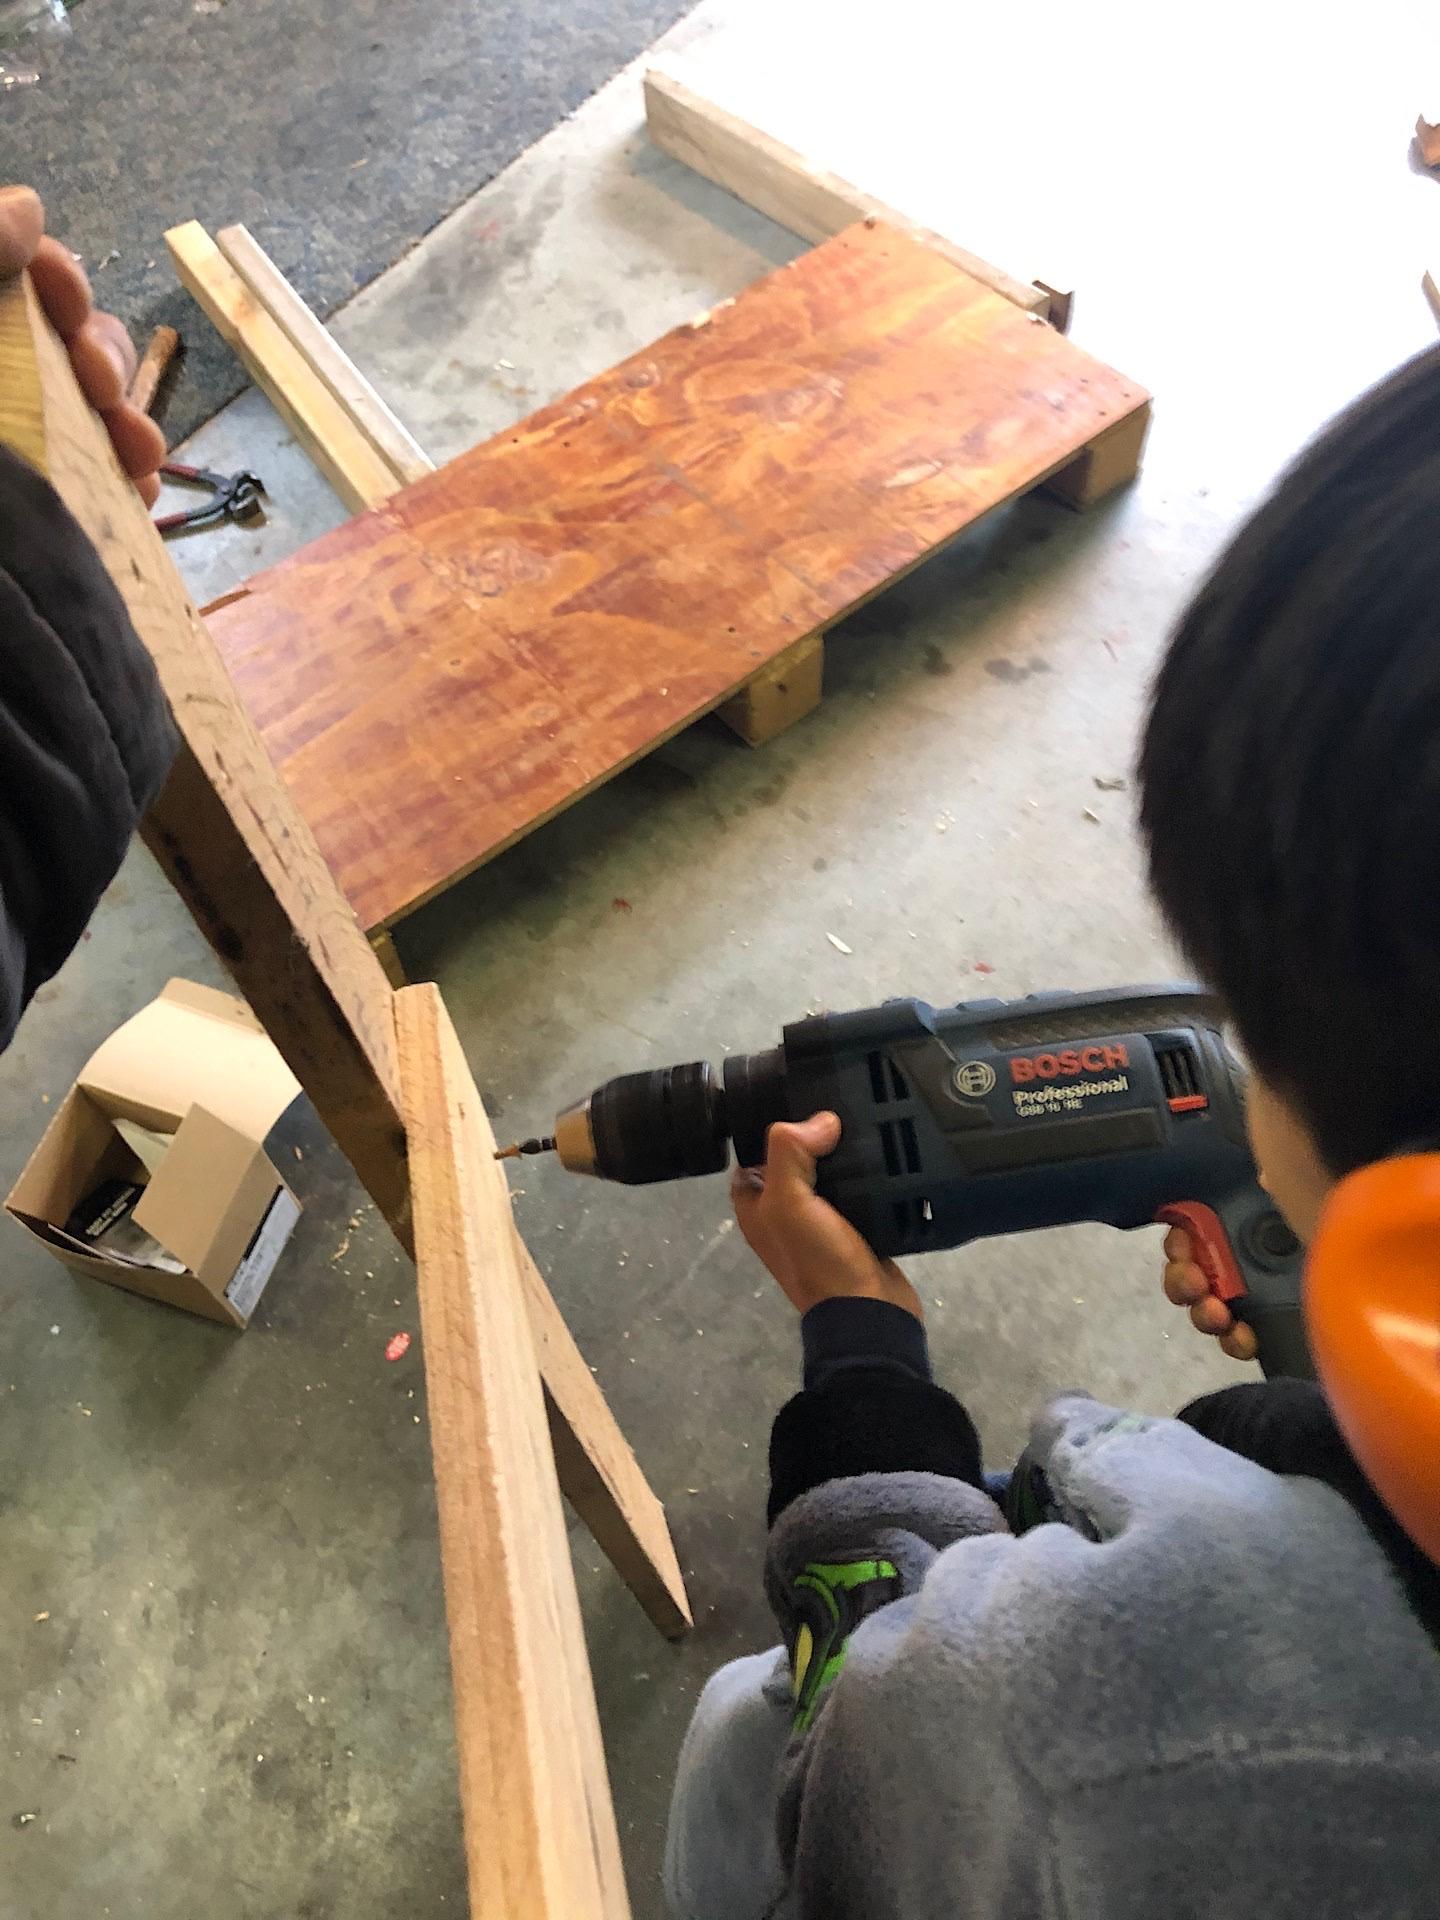 Thien-San remove screws of wooden boards